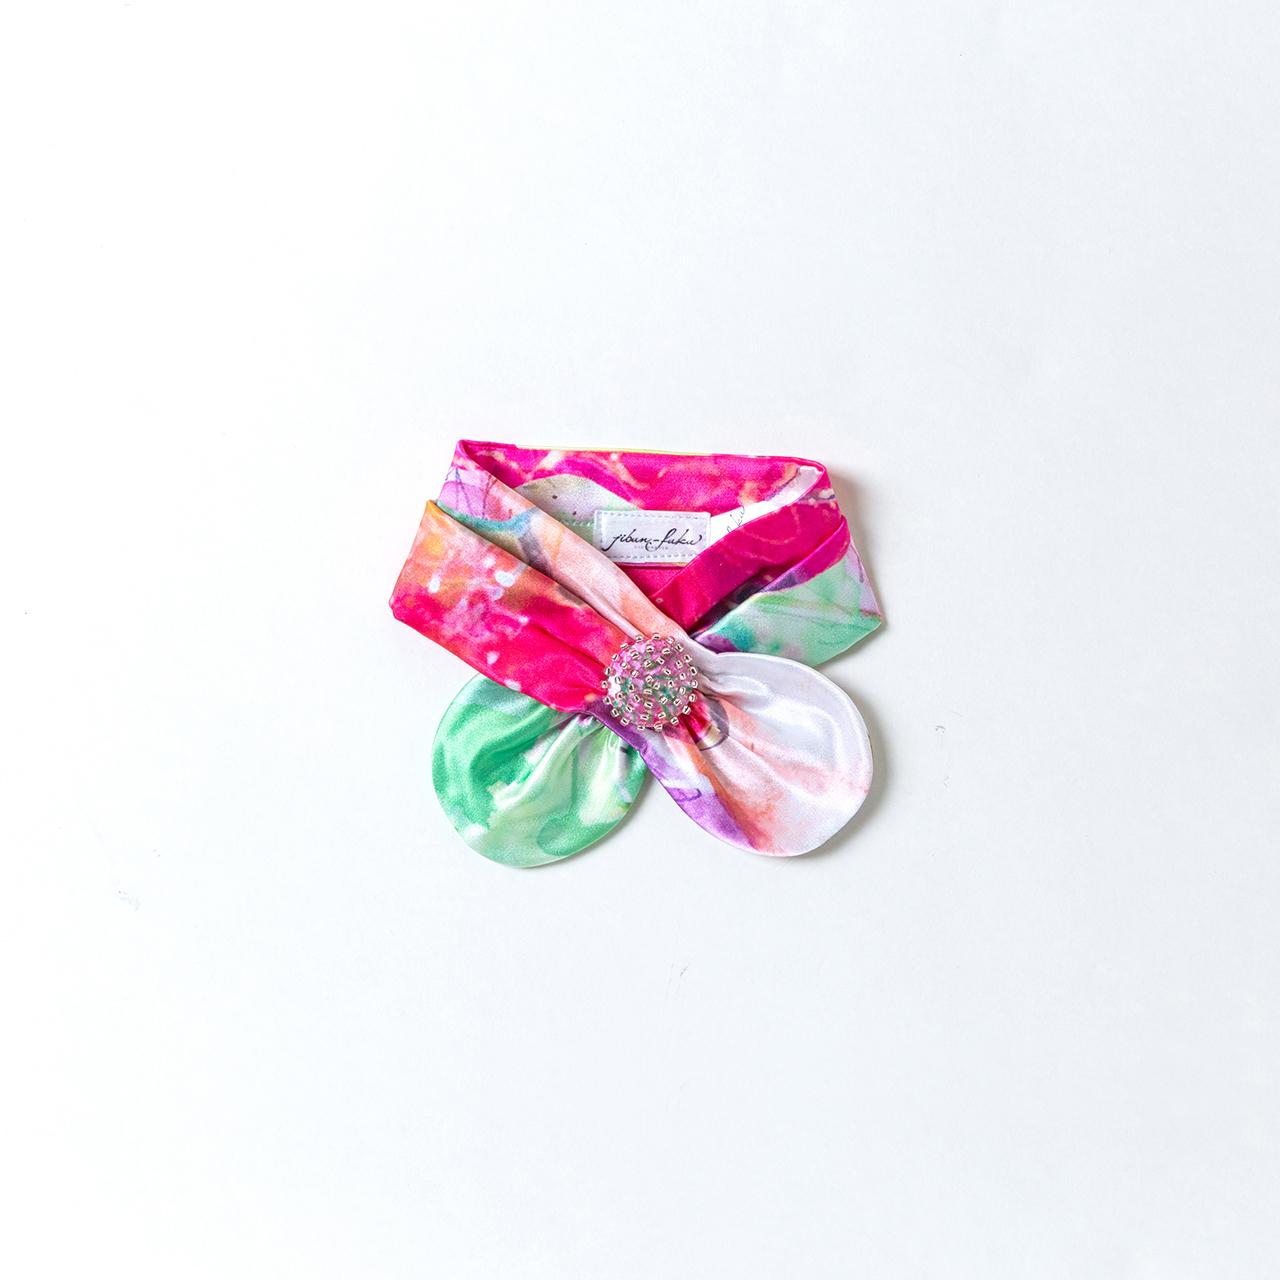 jibun-fuku DOG 【リボンカラー beads】 DOGRB201839